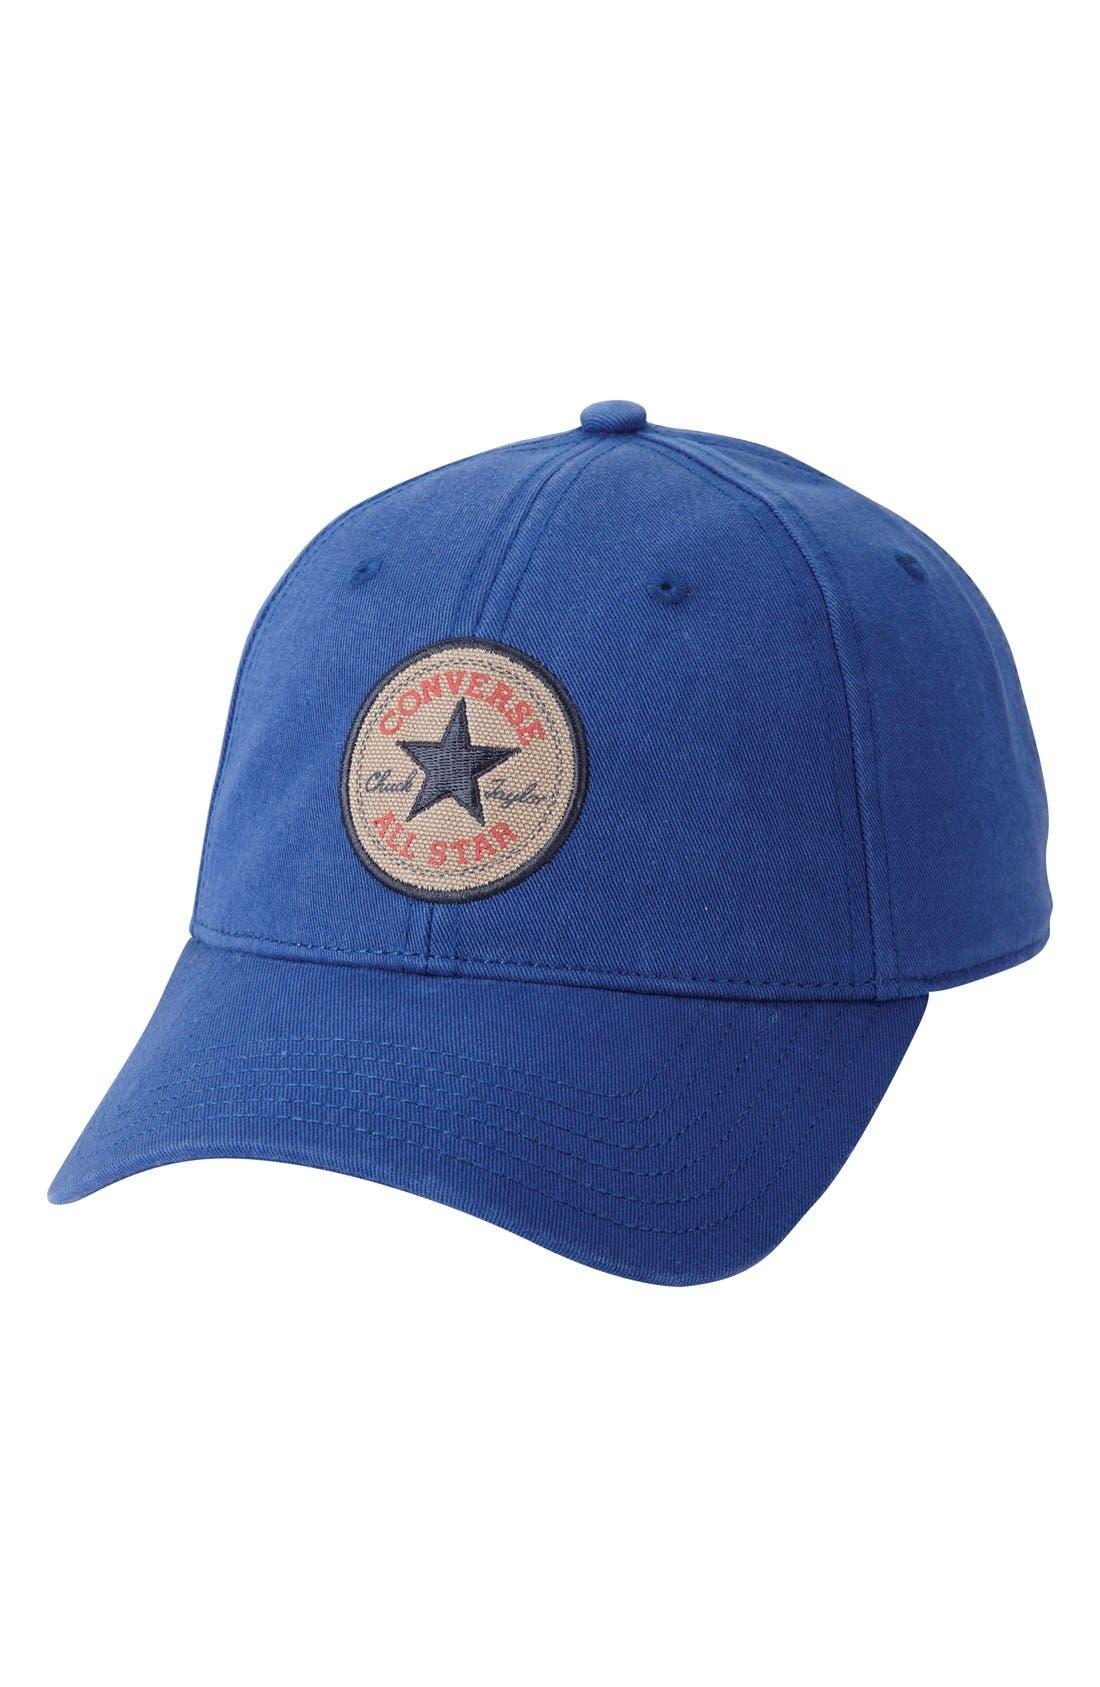 Alternate Image 1 Selected - Converse 'Core' Twill Ball Cap